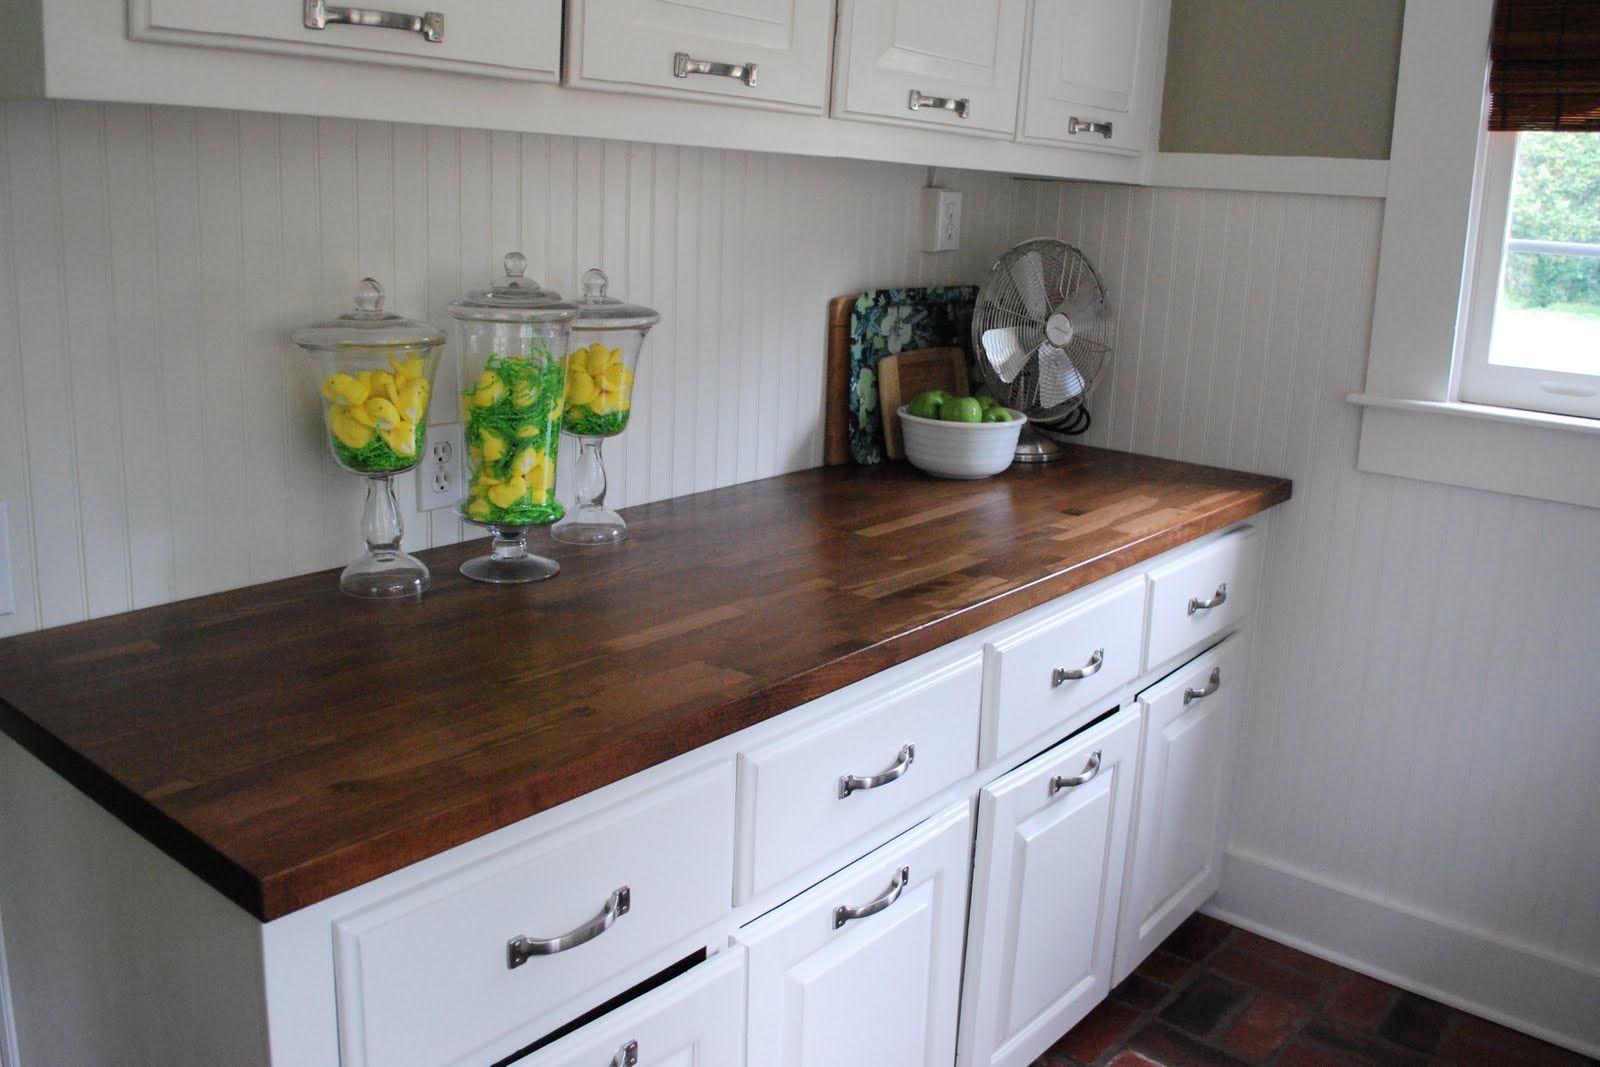 butcher block countertops ikea review ikea kitchen countertops Ikea Butcher Block Countertops Care